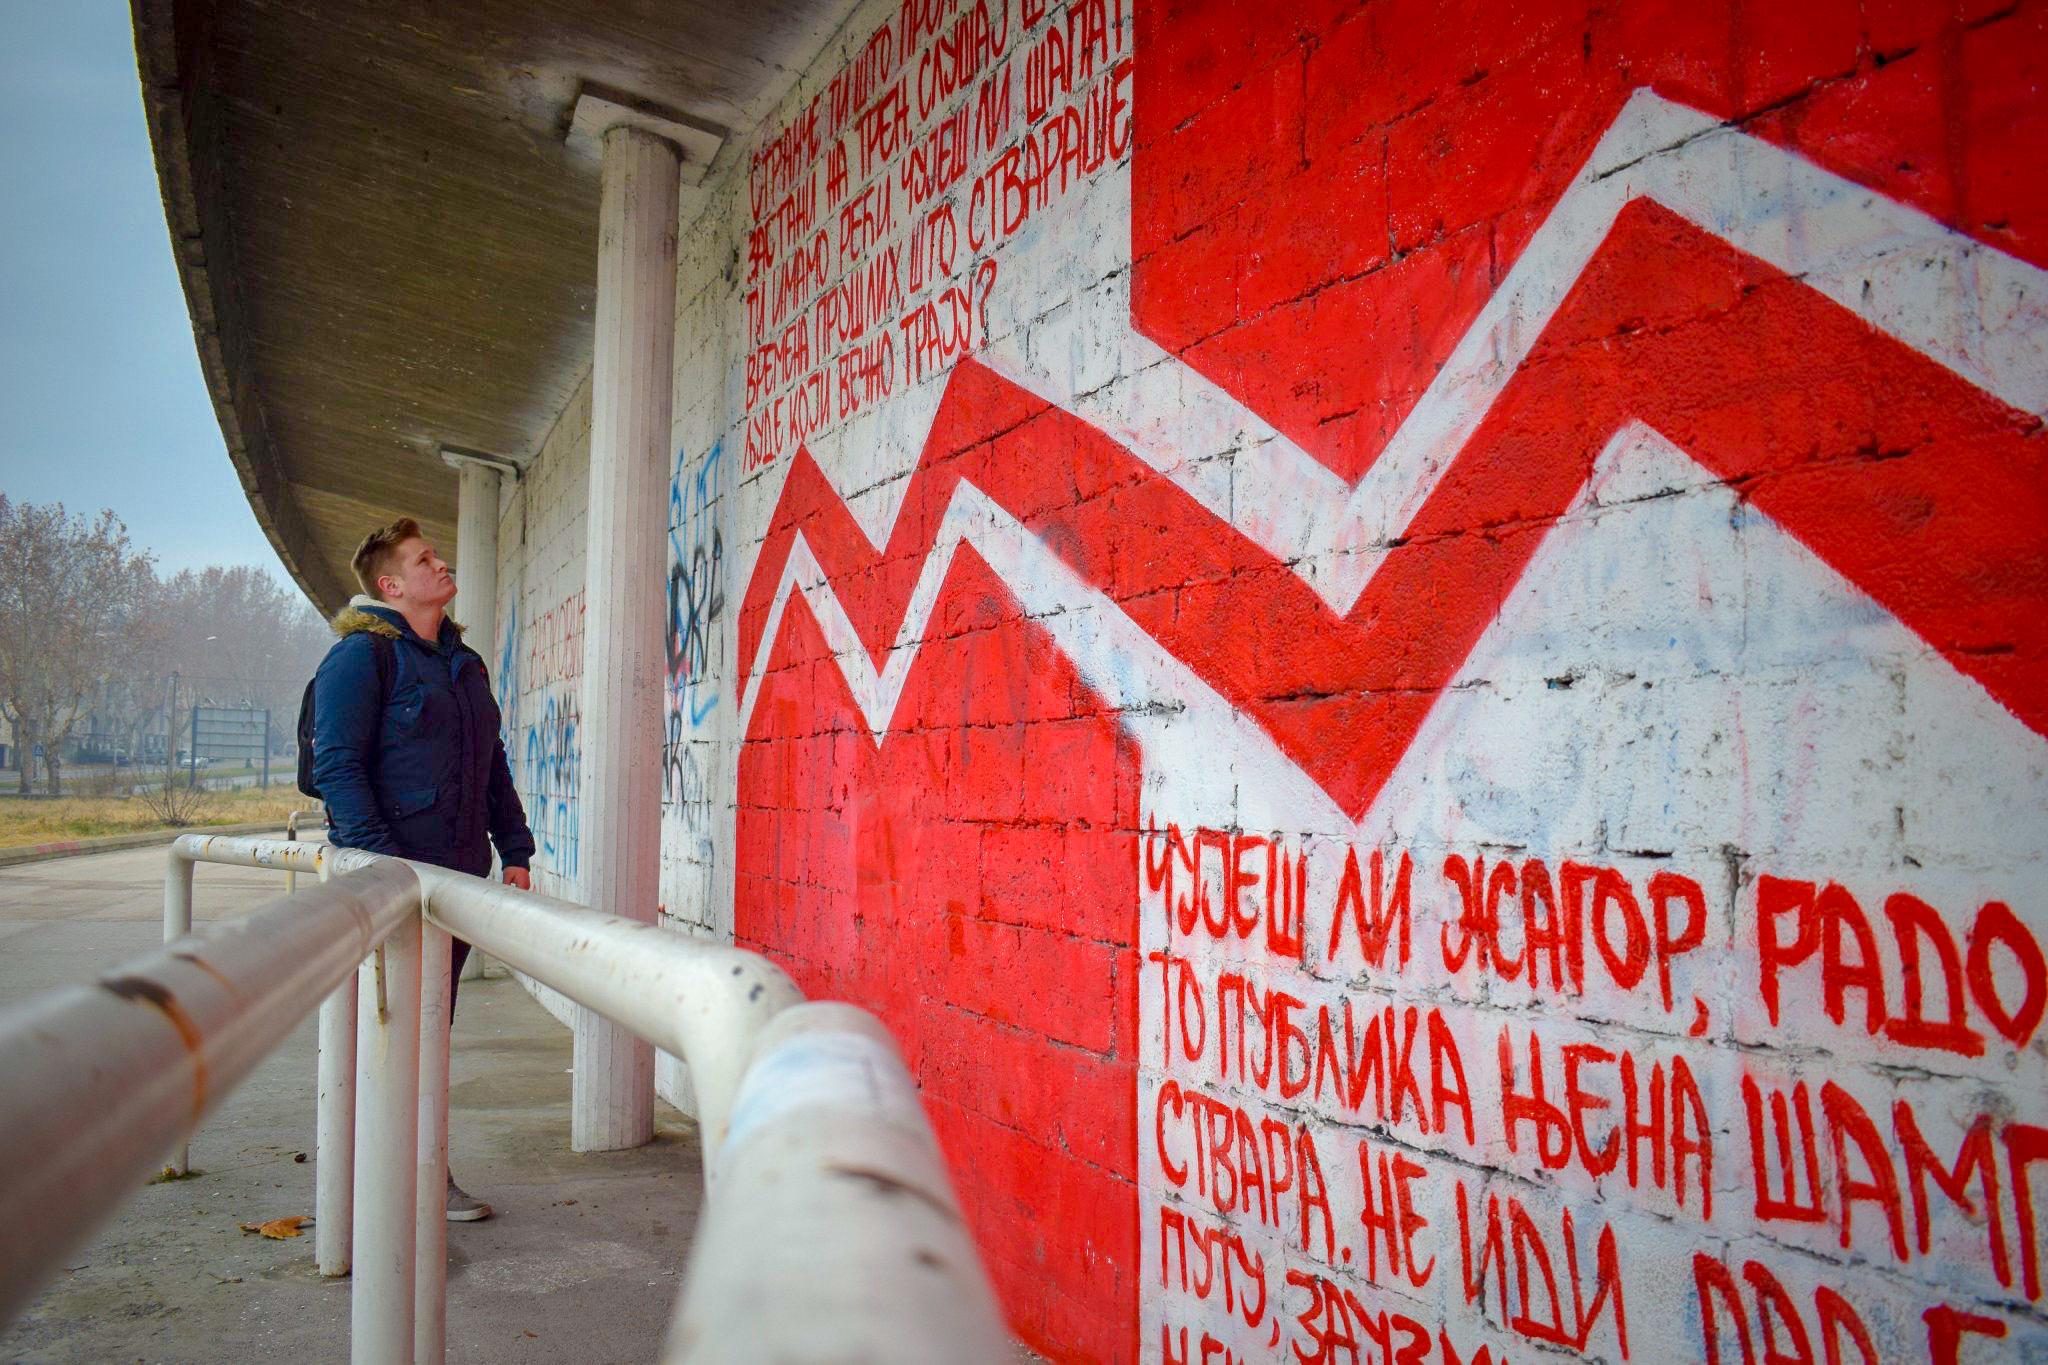 Admiring graffiti on the walls of Rajko Mitić Stadium, the home of Red Star Belgrade.